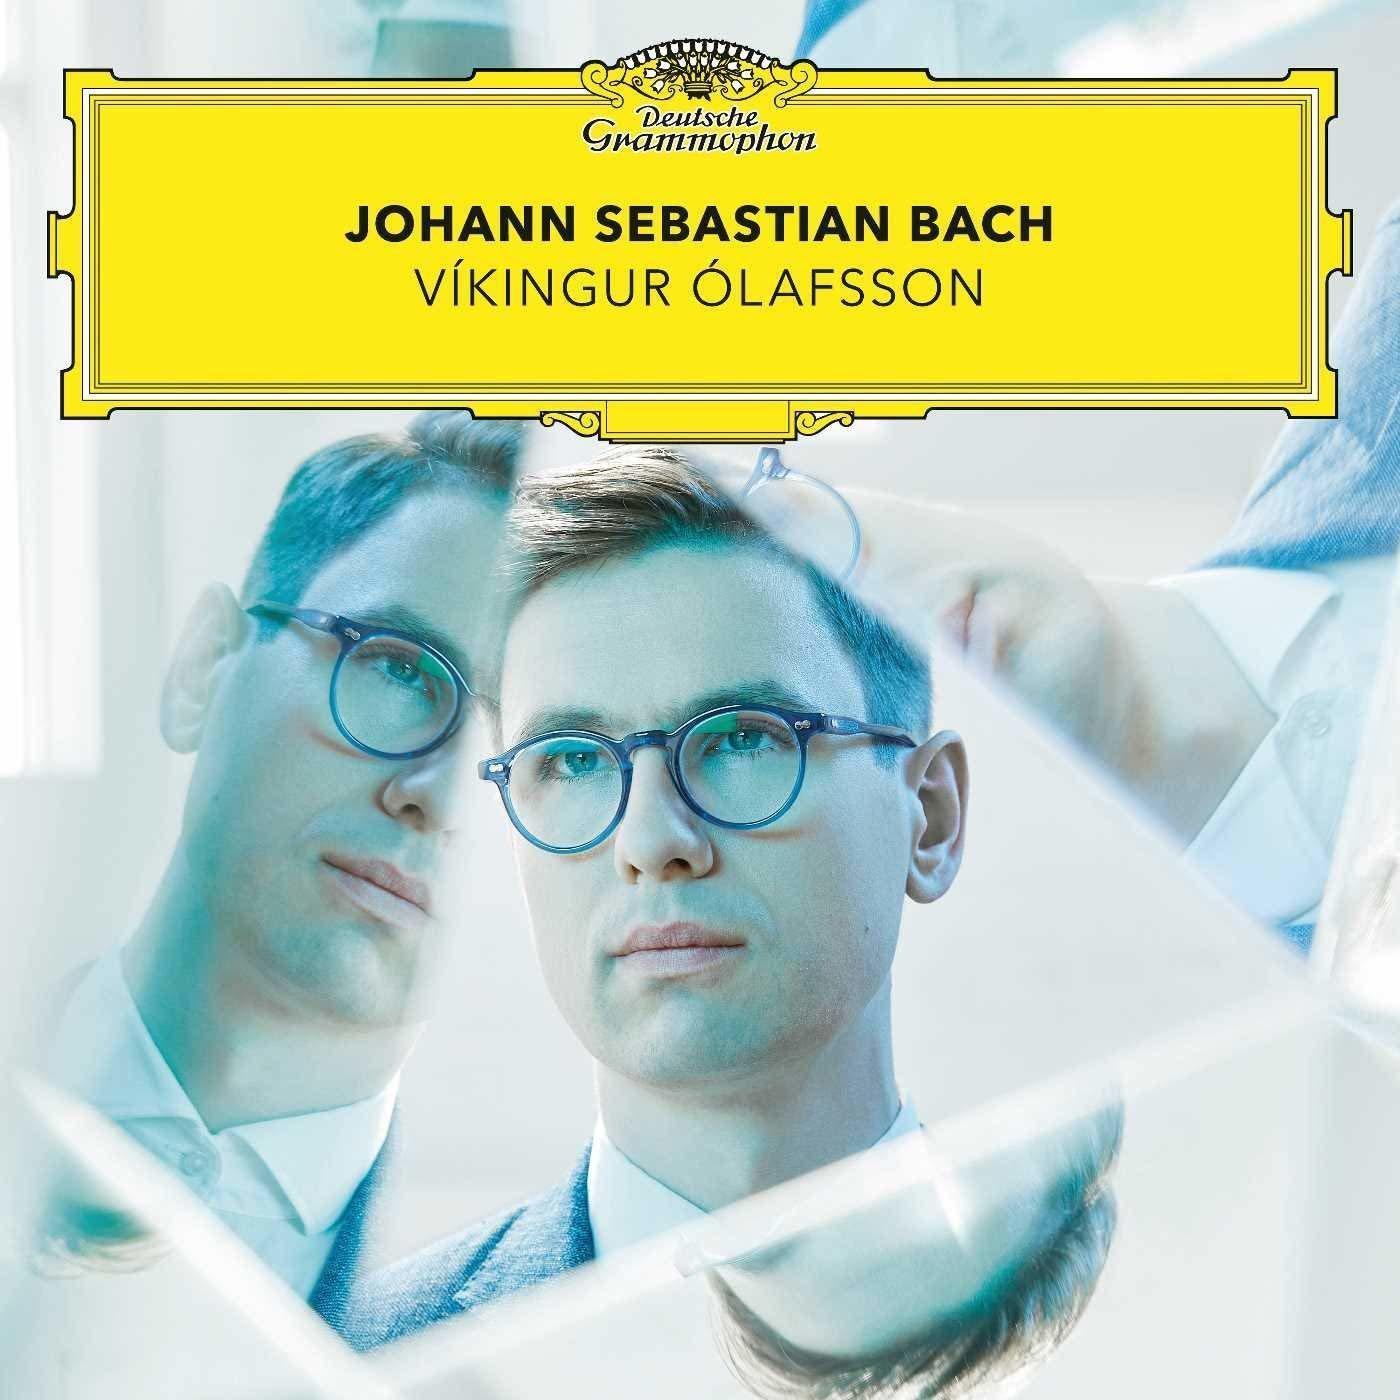 JohannSebastianBach